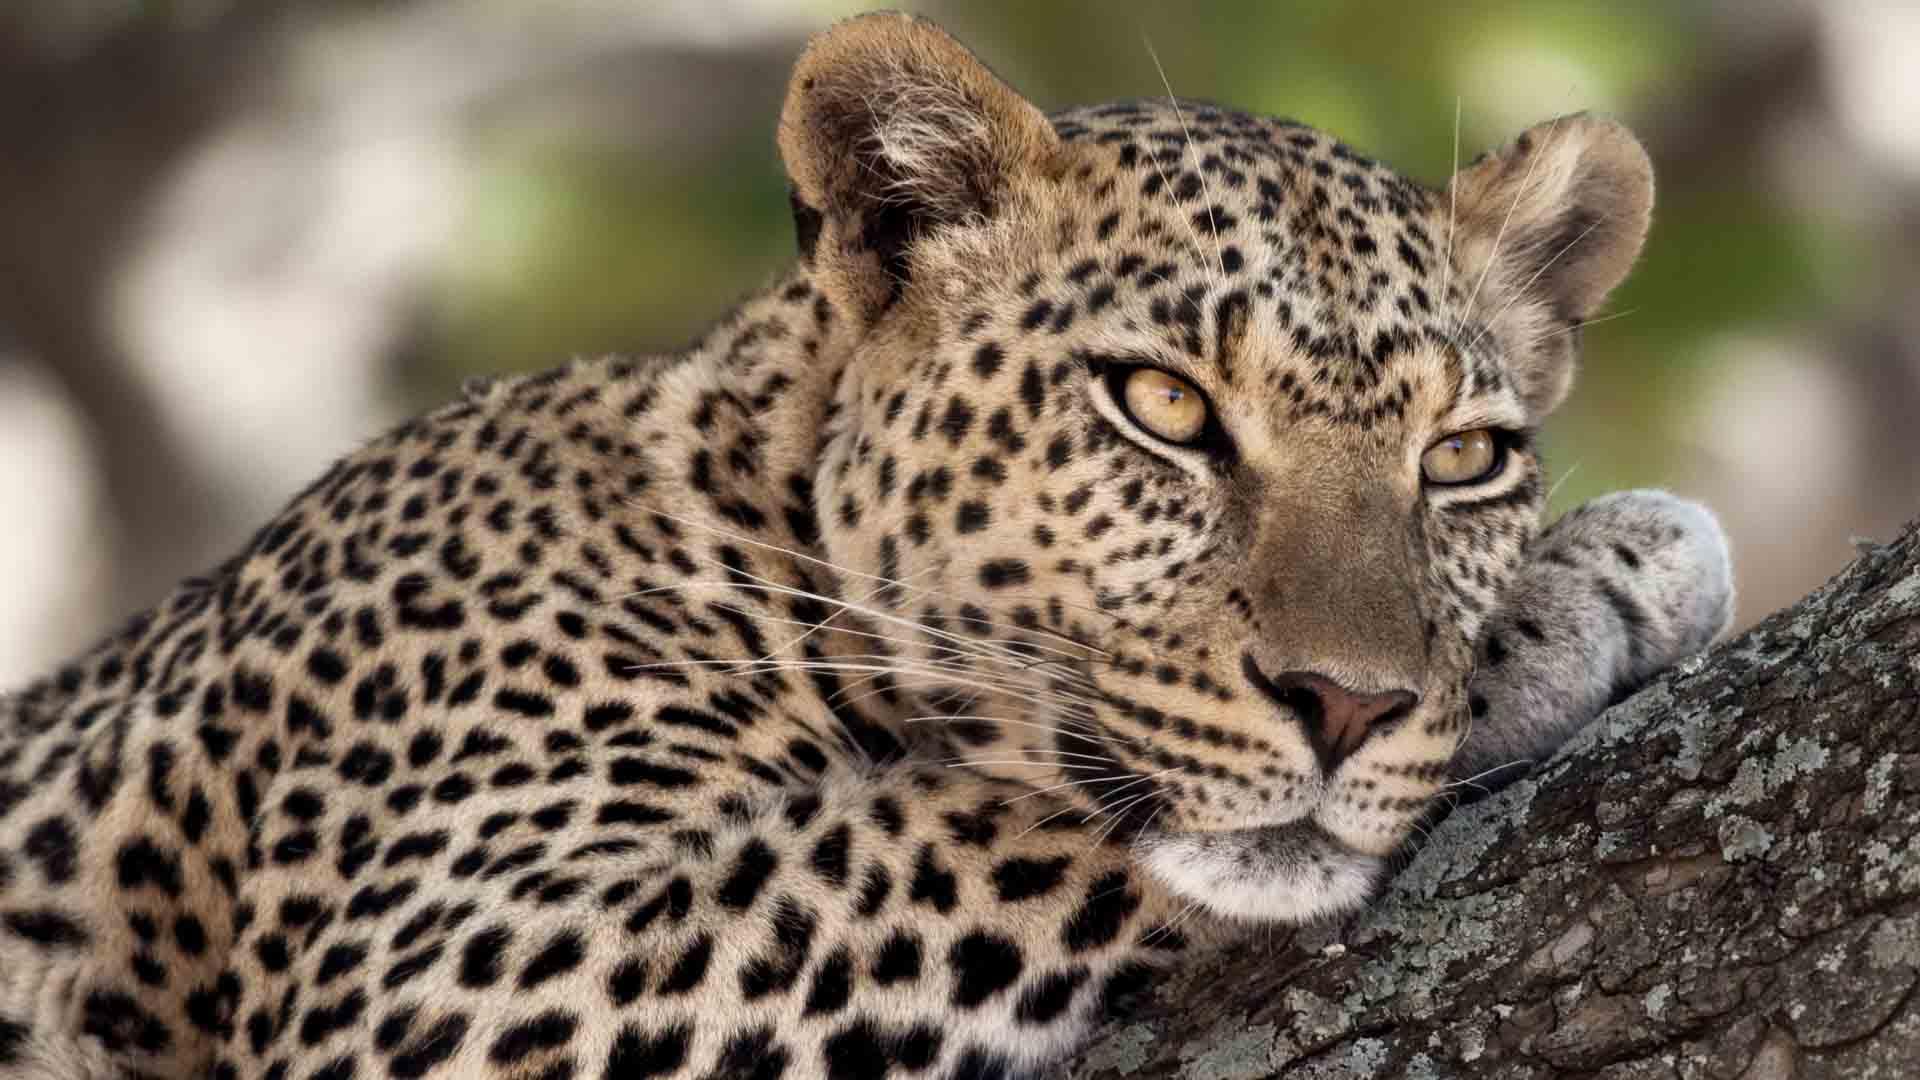 nws-st-tanzania-leopard-close-up